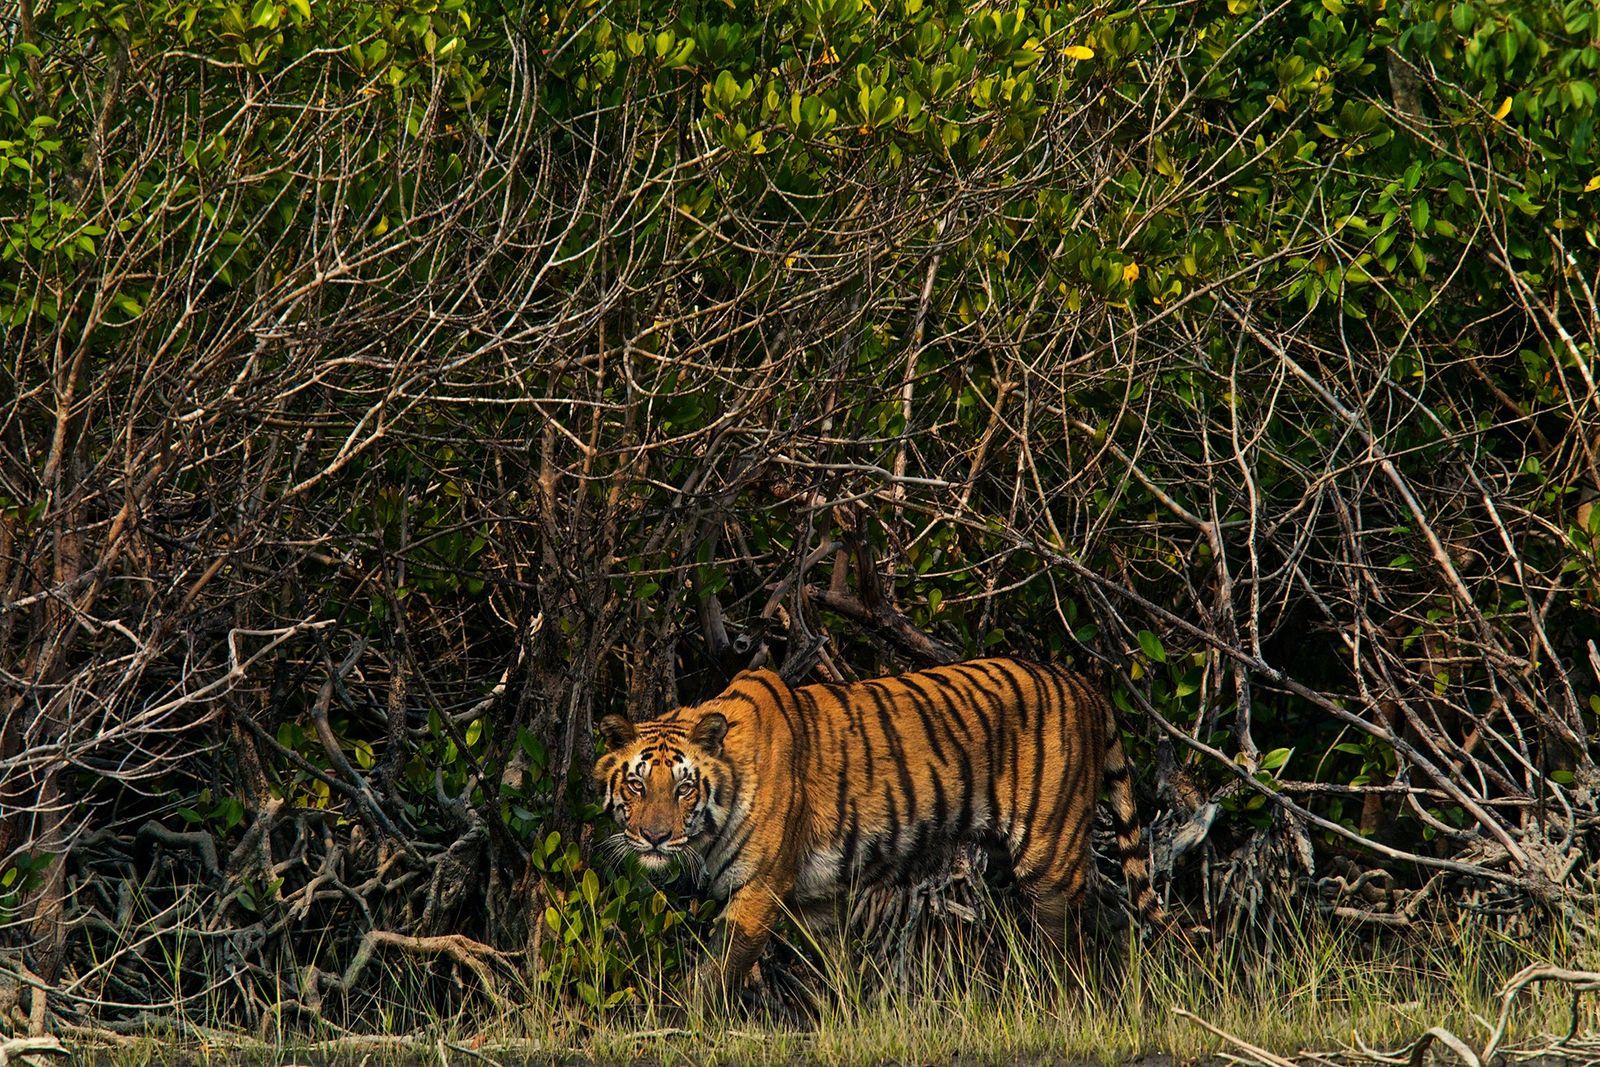 Pirates are killing Bengal tigers